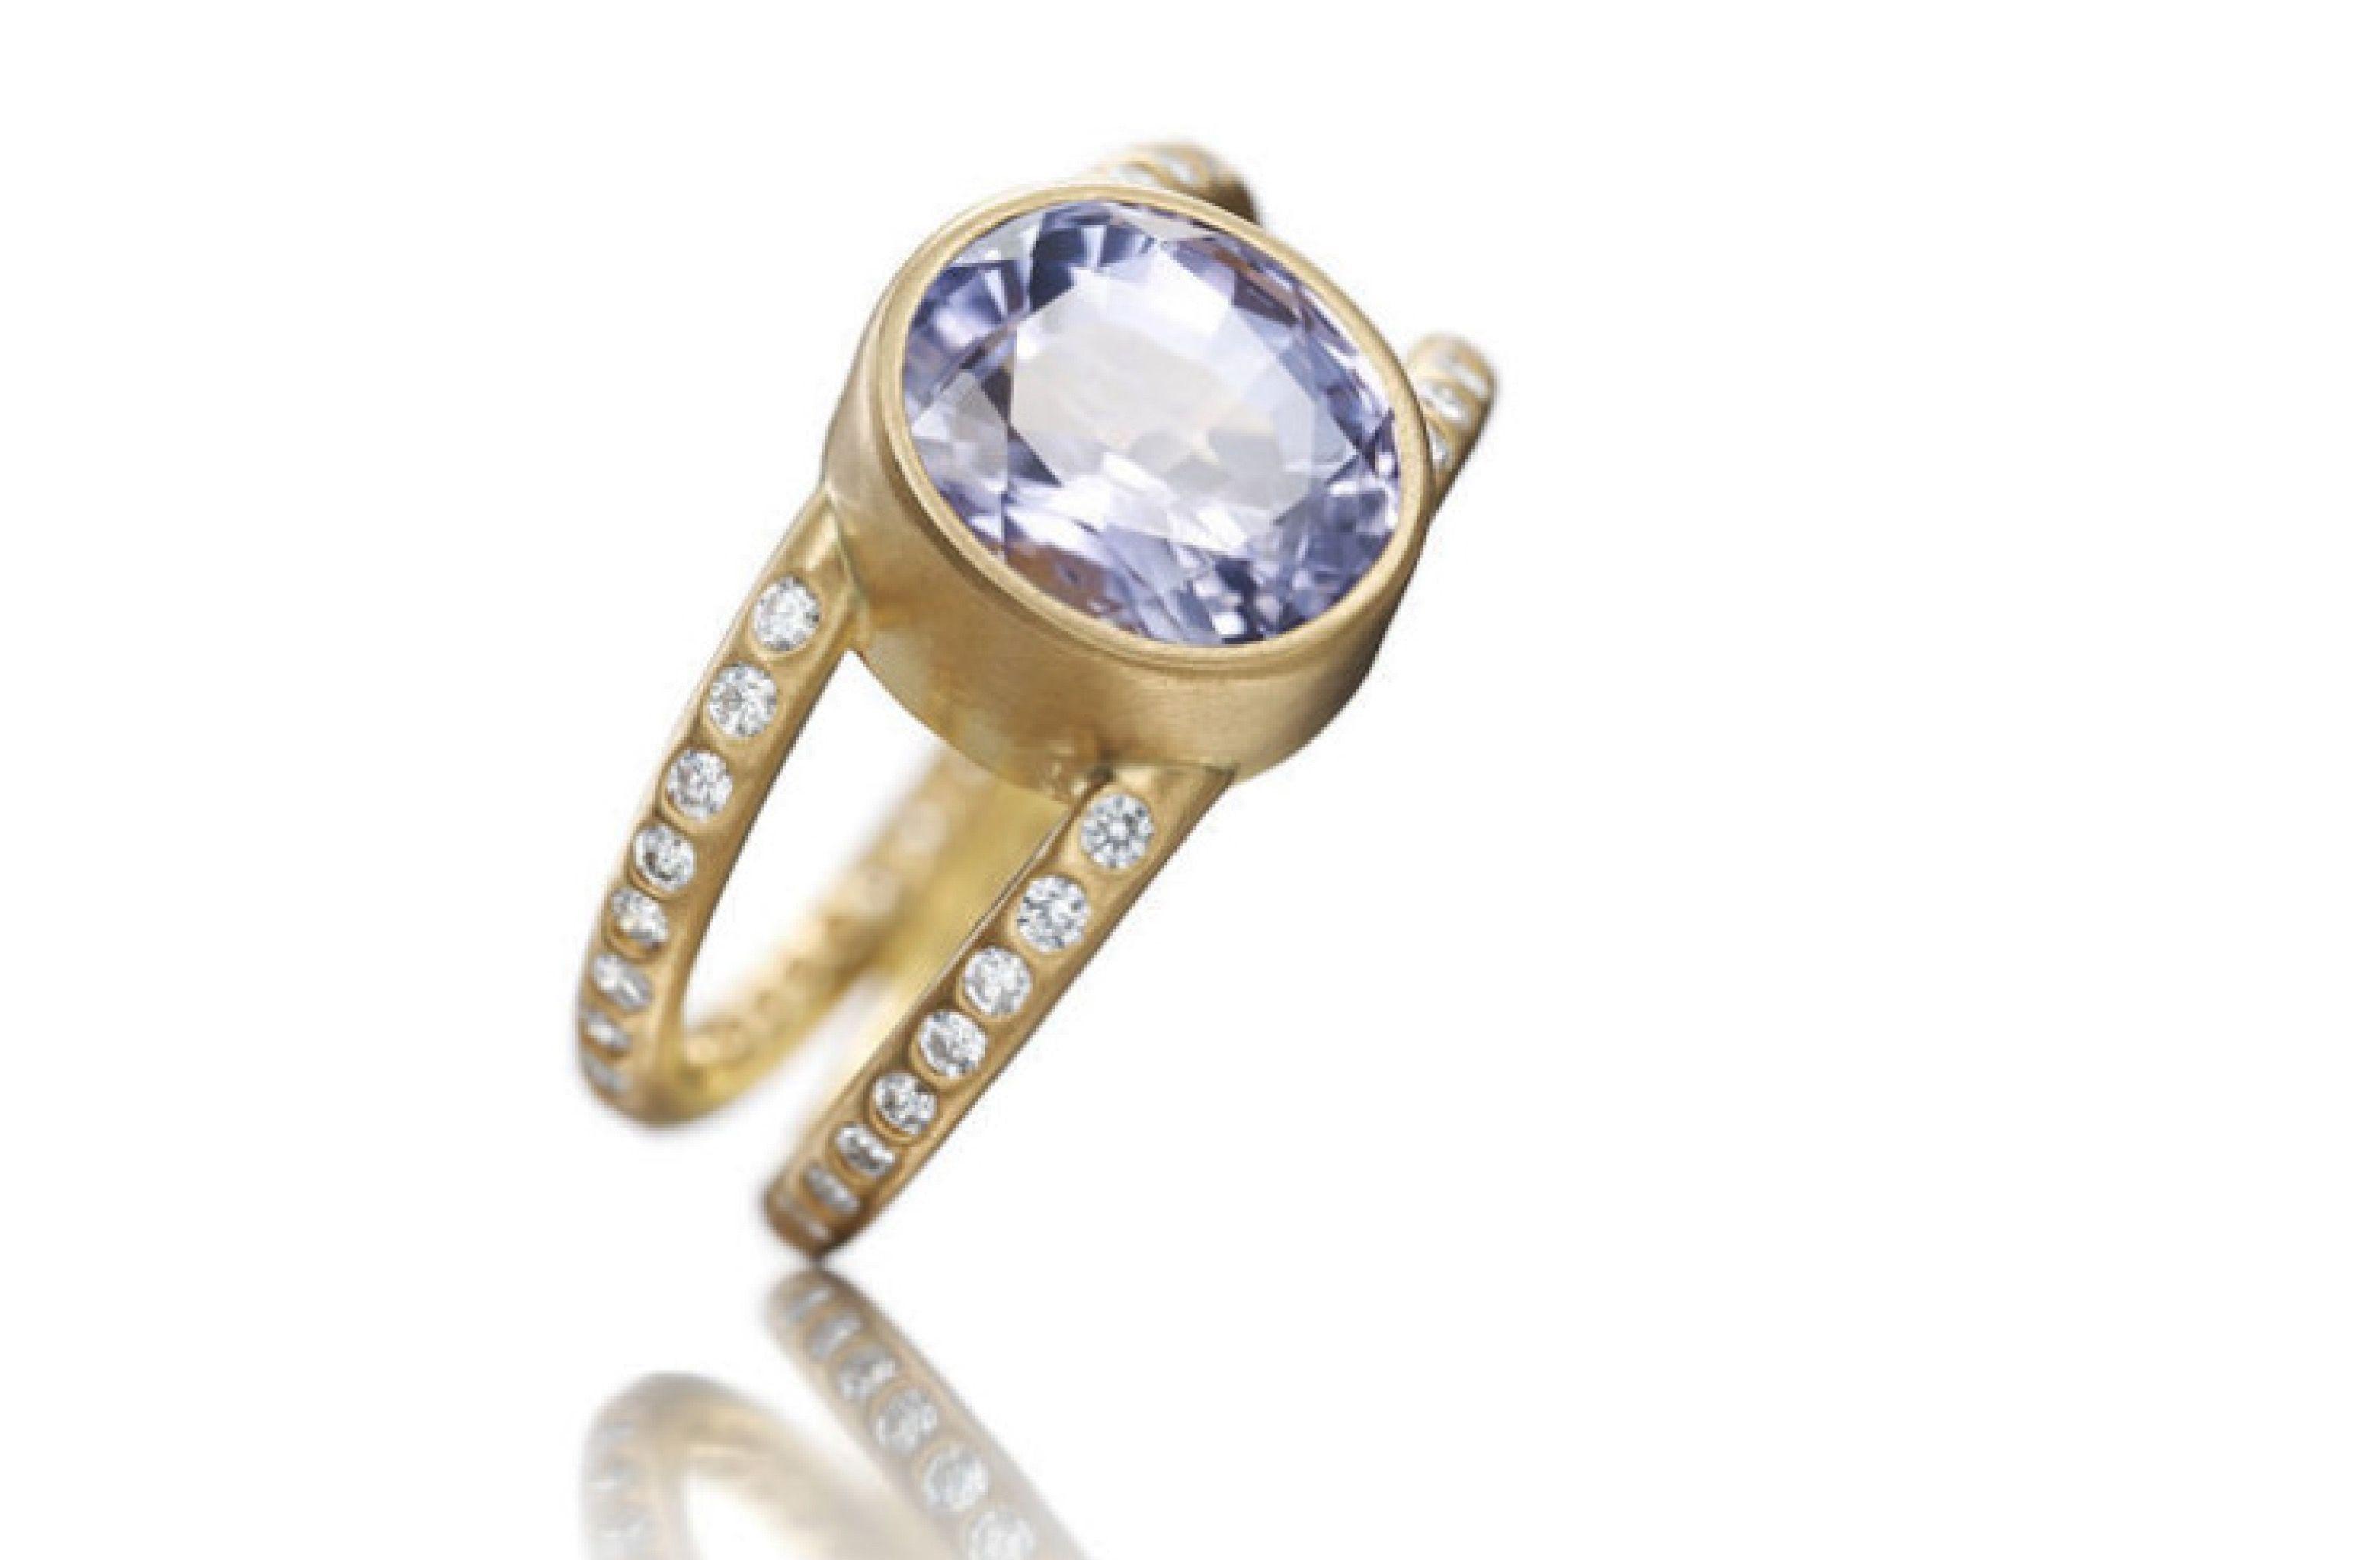 JewelryWhite_22.jpg